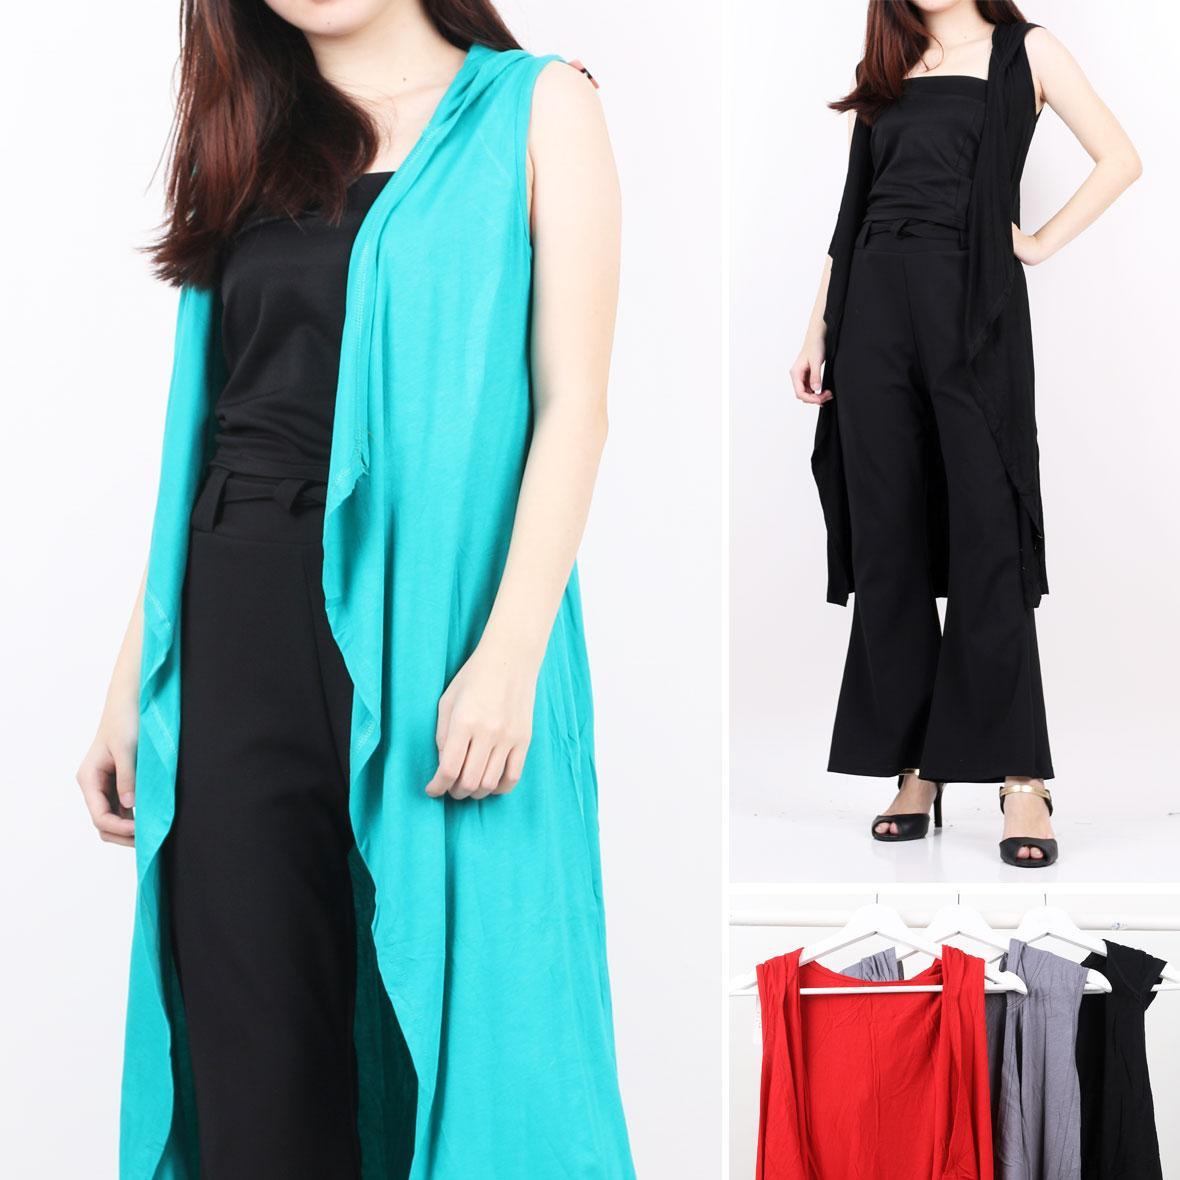 Oma Holley Fashion Cardiana Cardigan Sleeveless Polos 7 Warna-Size M